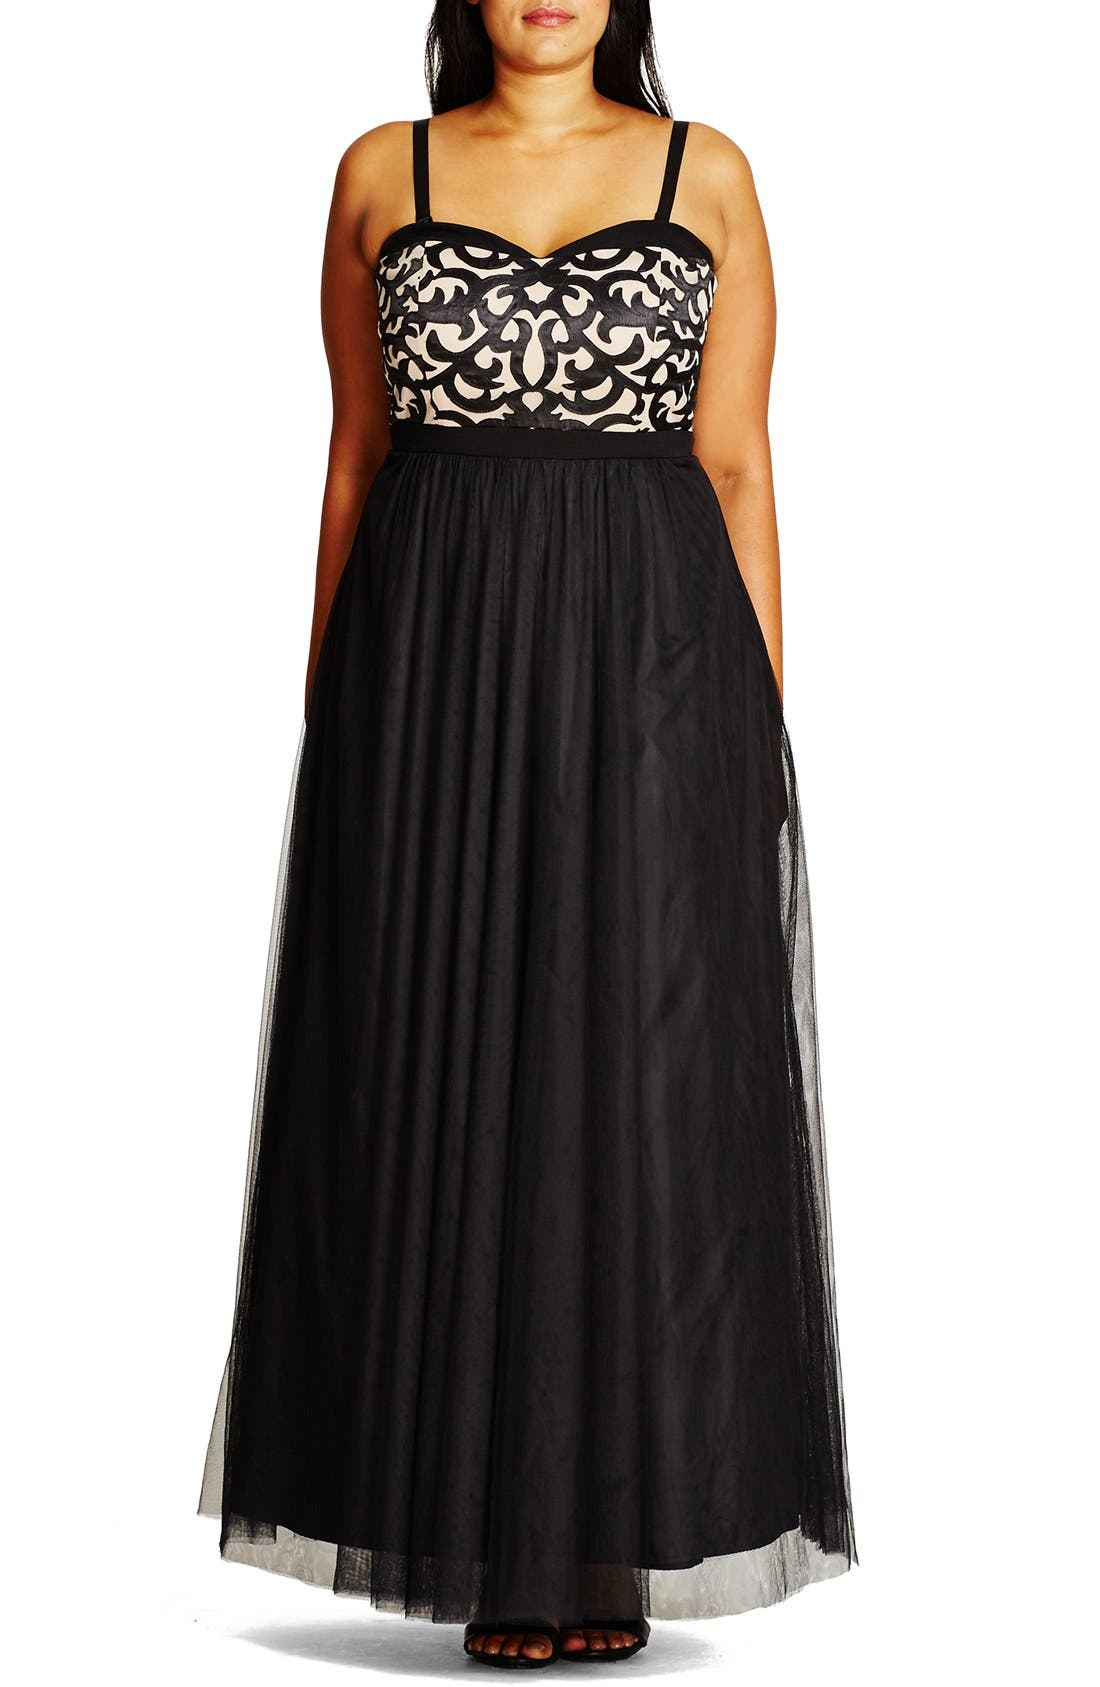 CITY CHIC, 'It Girl' Maxi Dress, Main thumbnail 1, color, BLACK